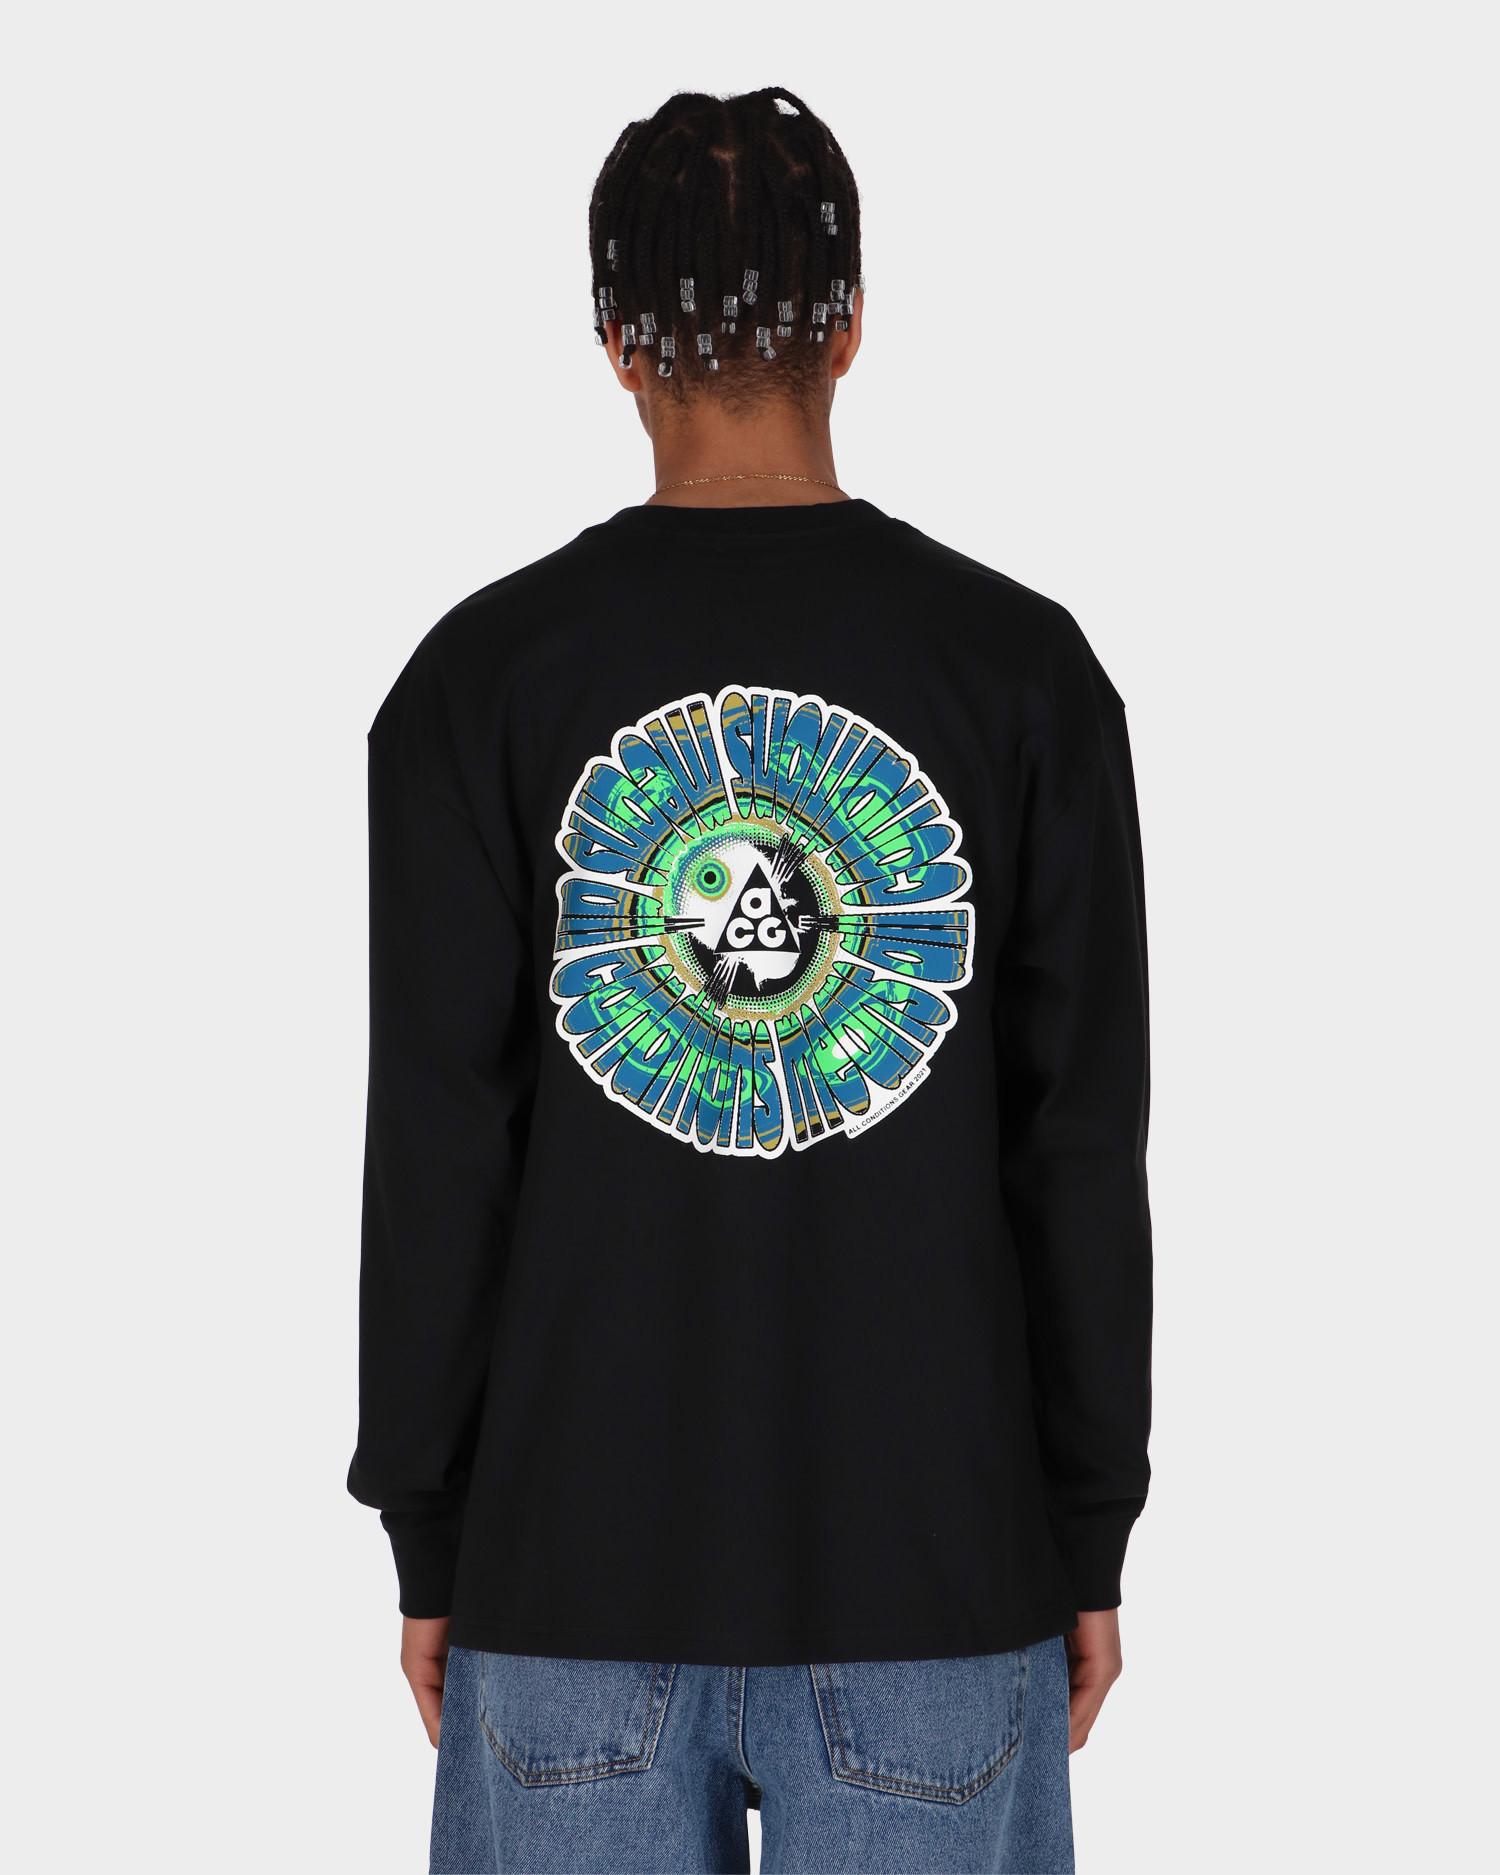 Nike M NRG ACG Circle Longsleeve T-shirt Black